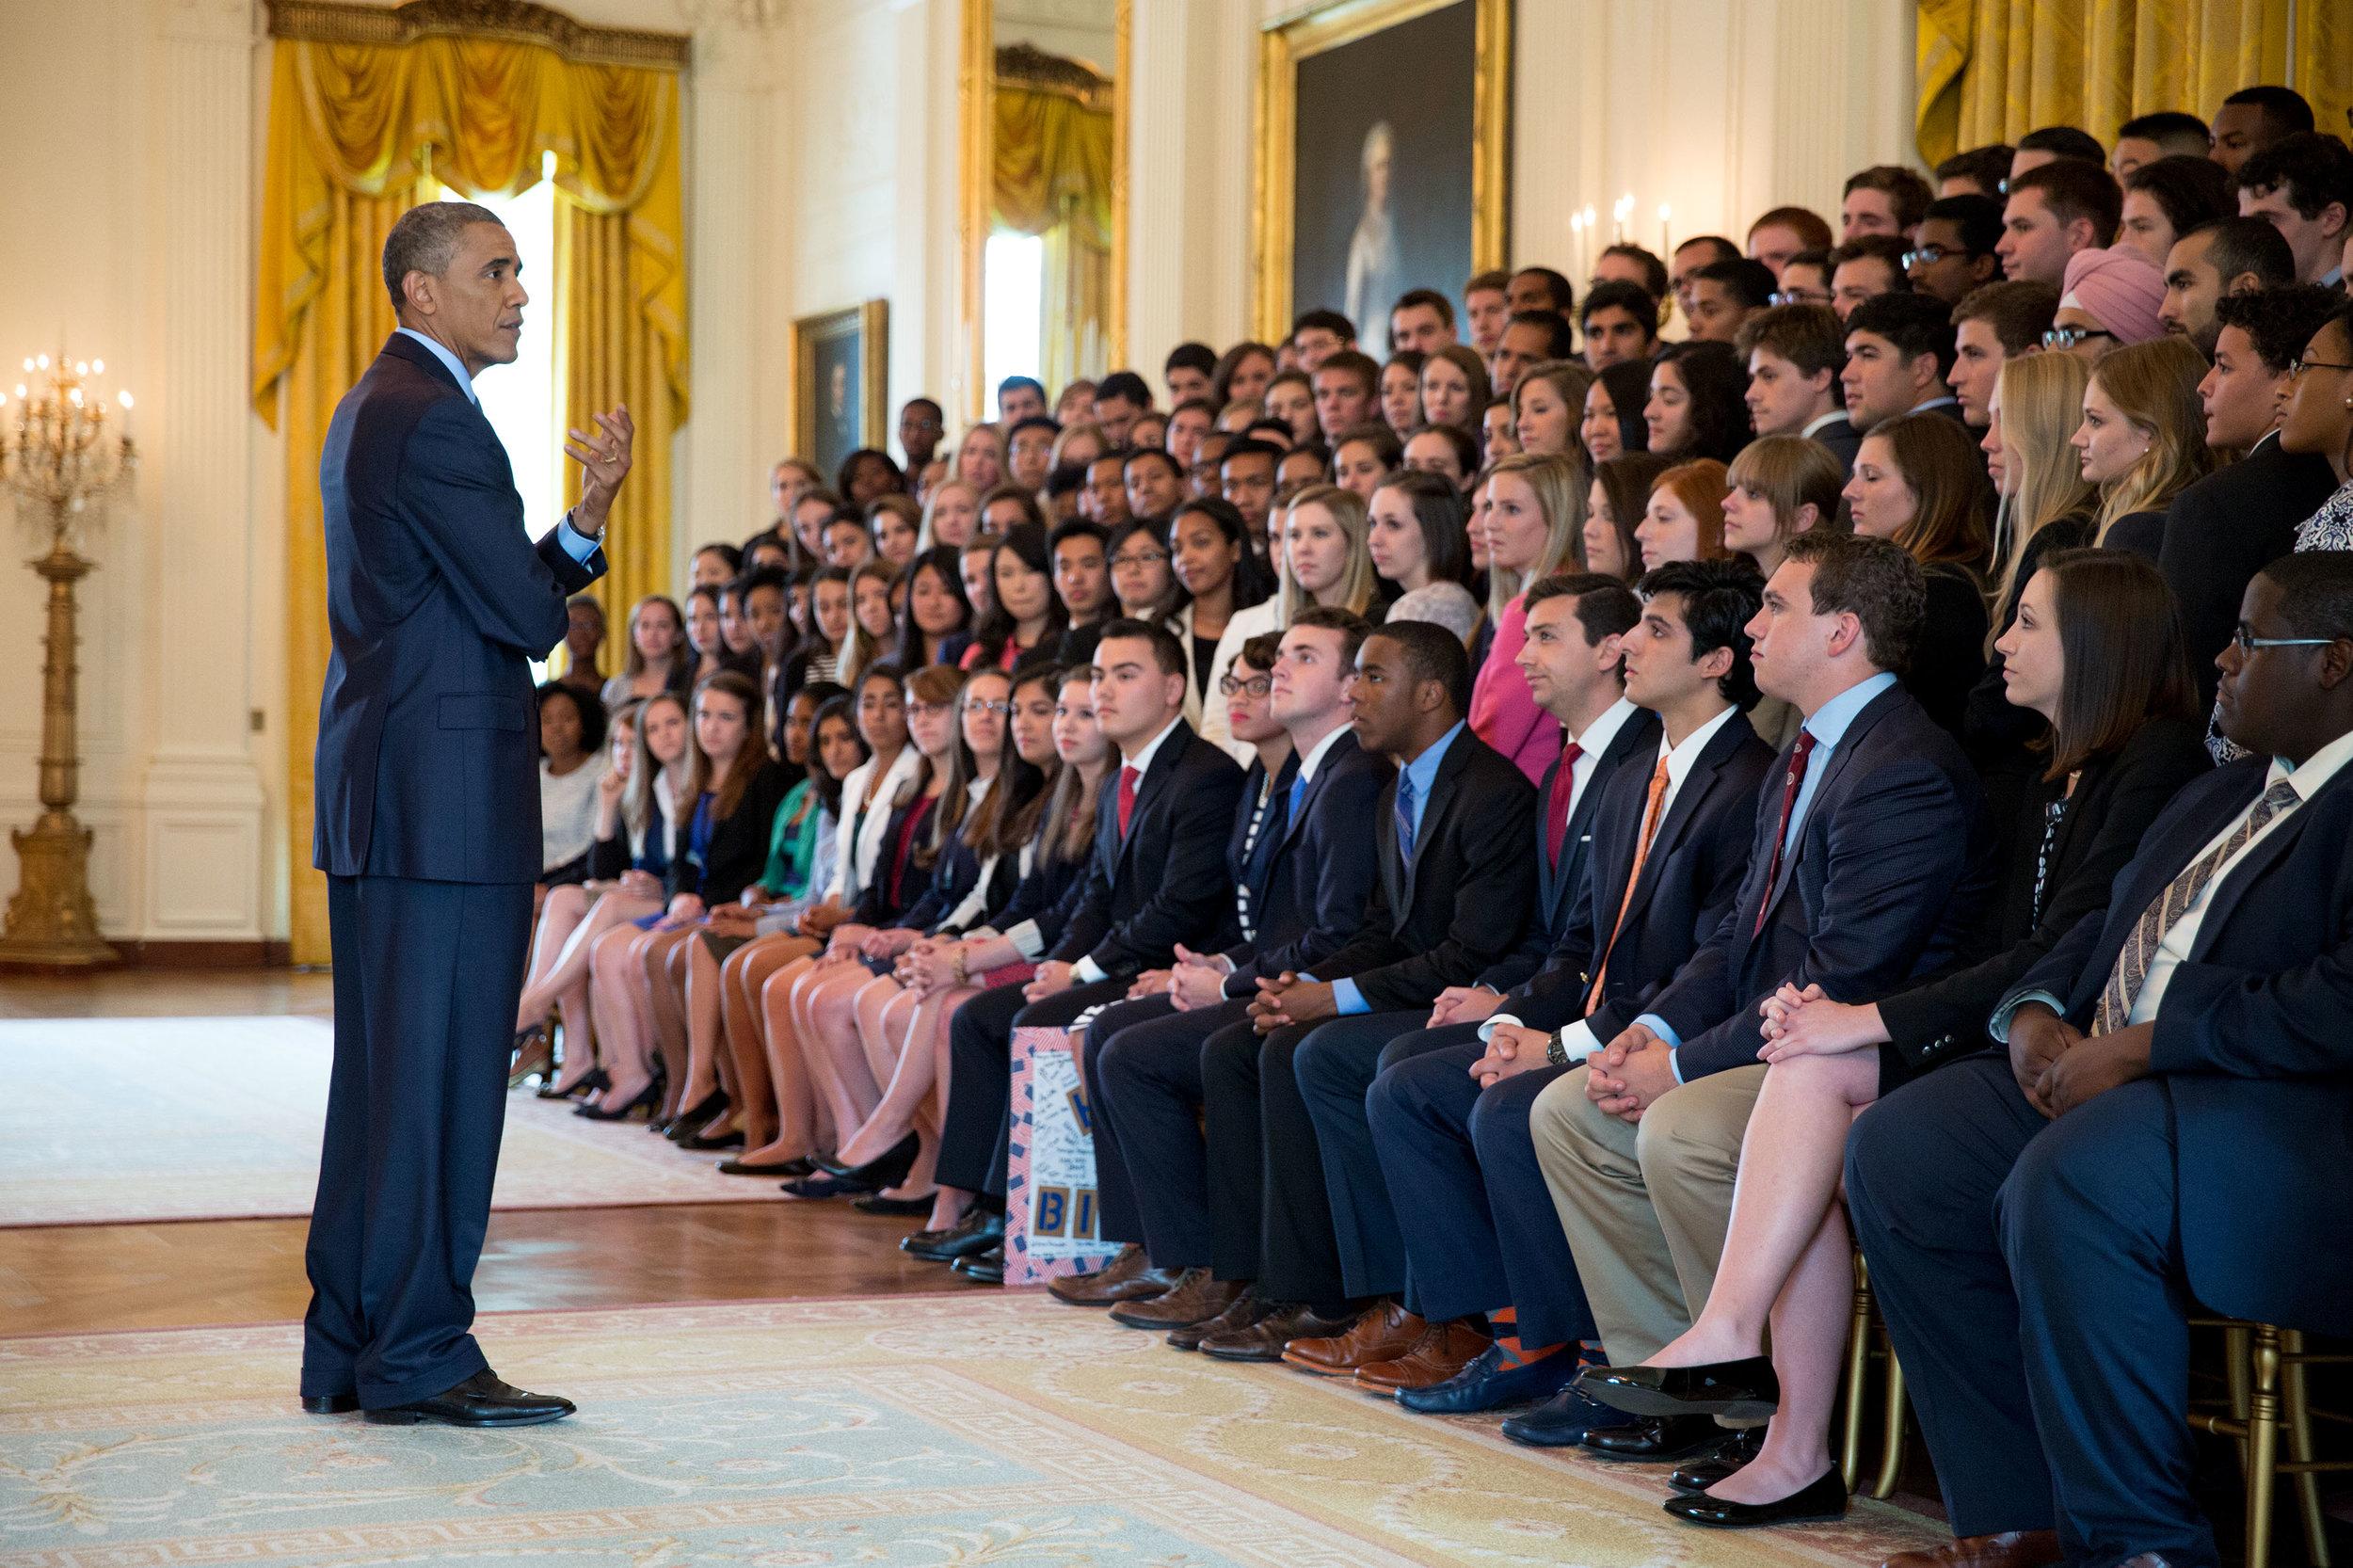 President Obama speaks to summer interns.